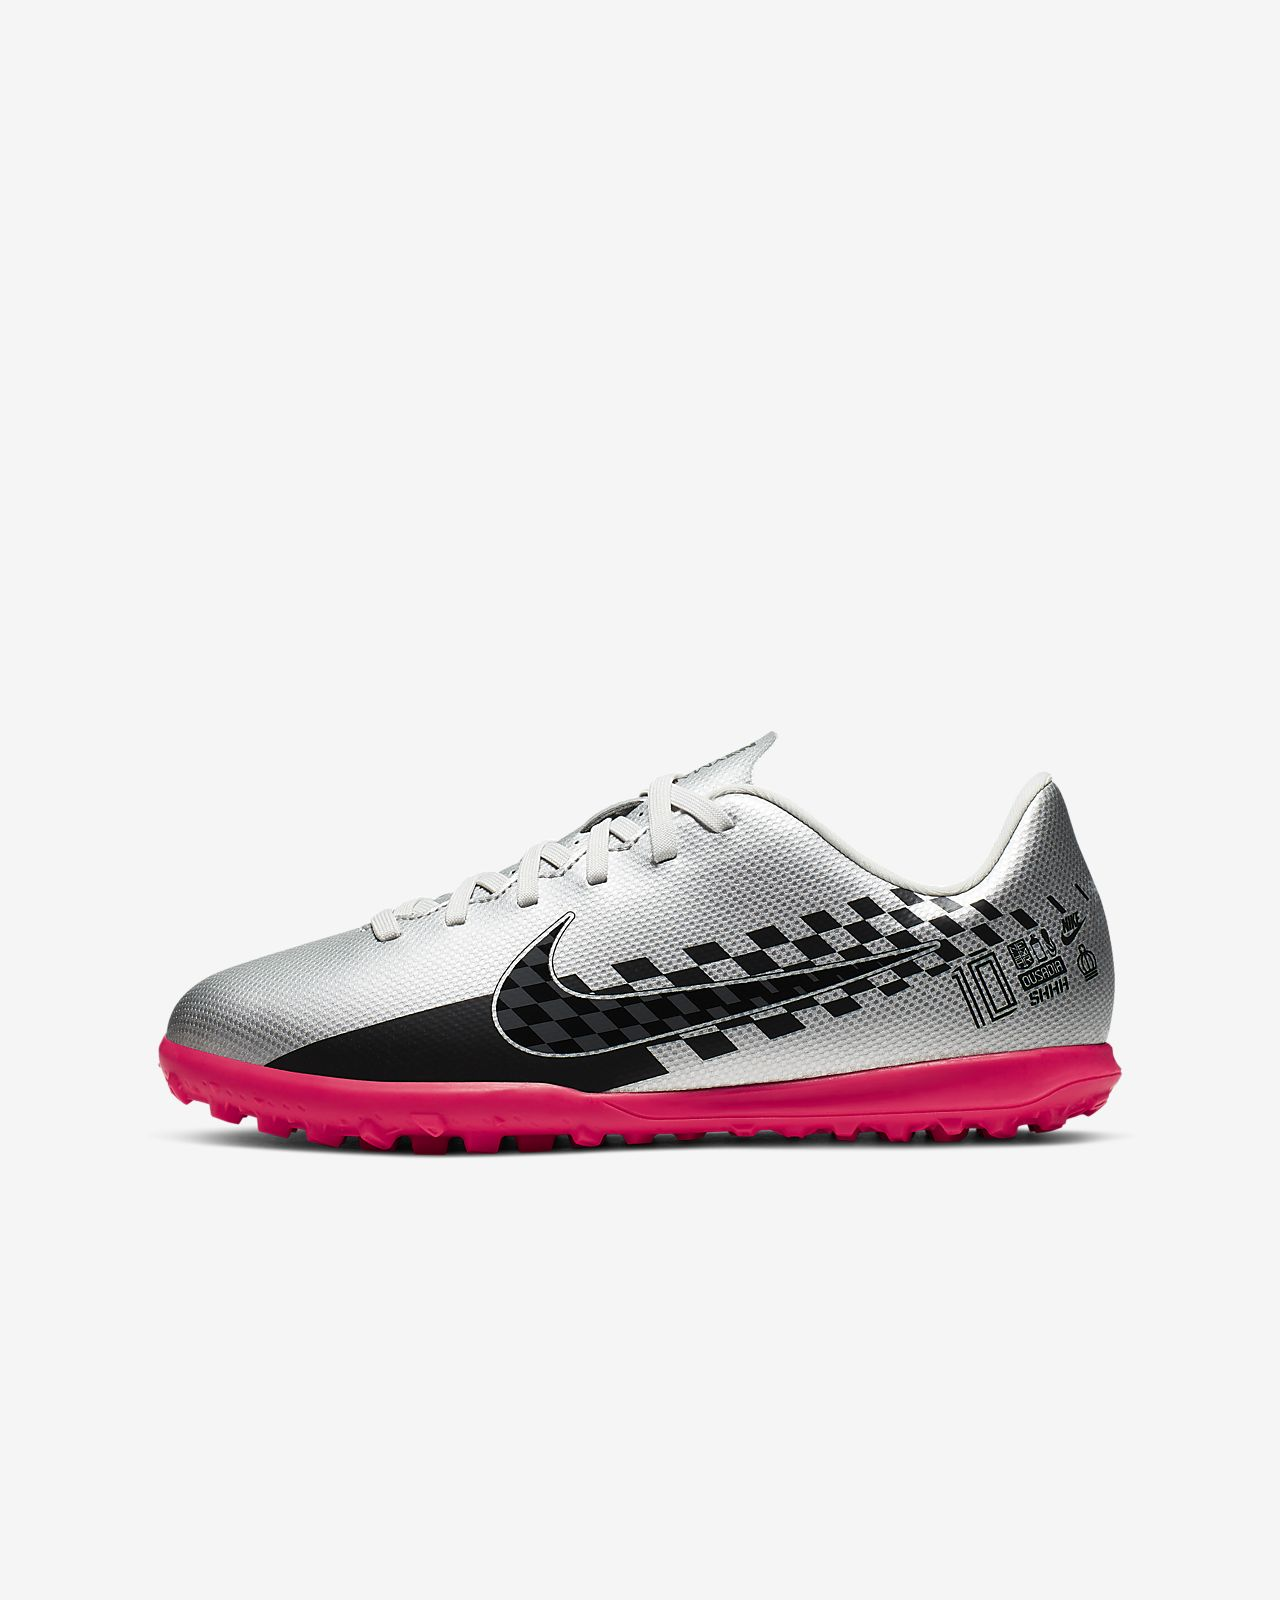 Nike Jr. Mercurial Vapor 13 Club Neymar Jr. TF Kids' Artificial-Turf Football Shoe